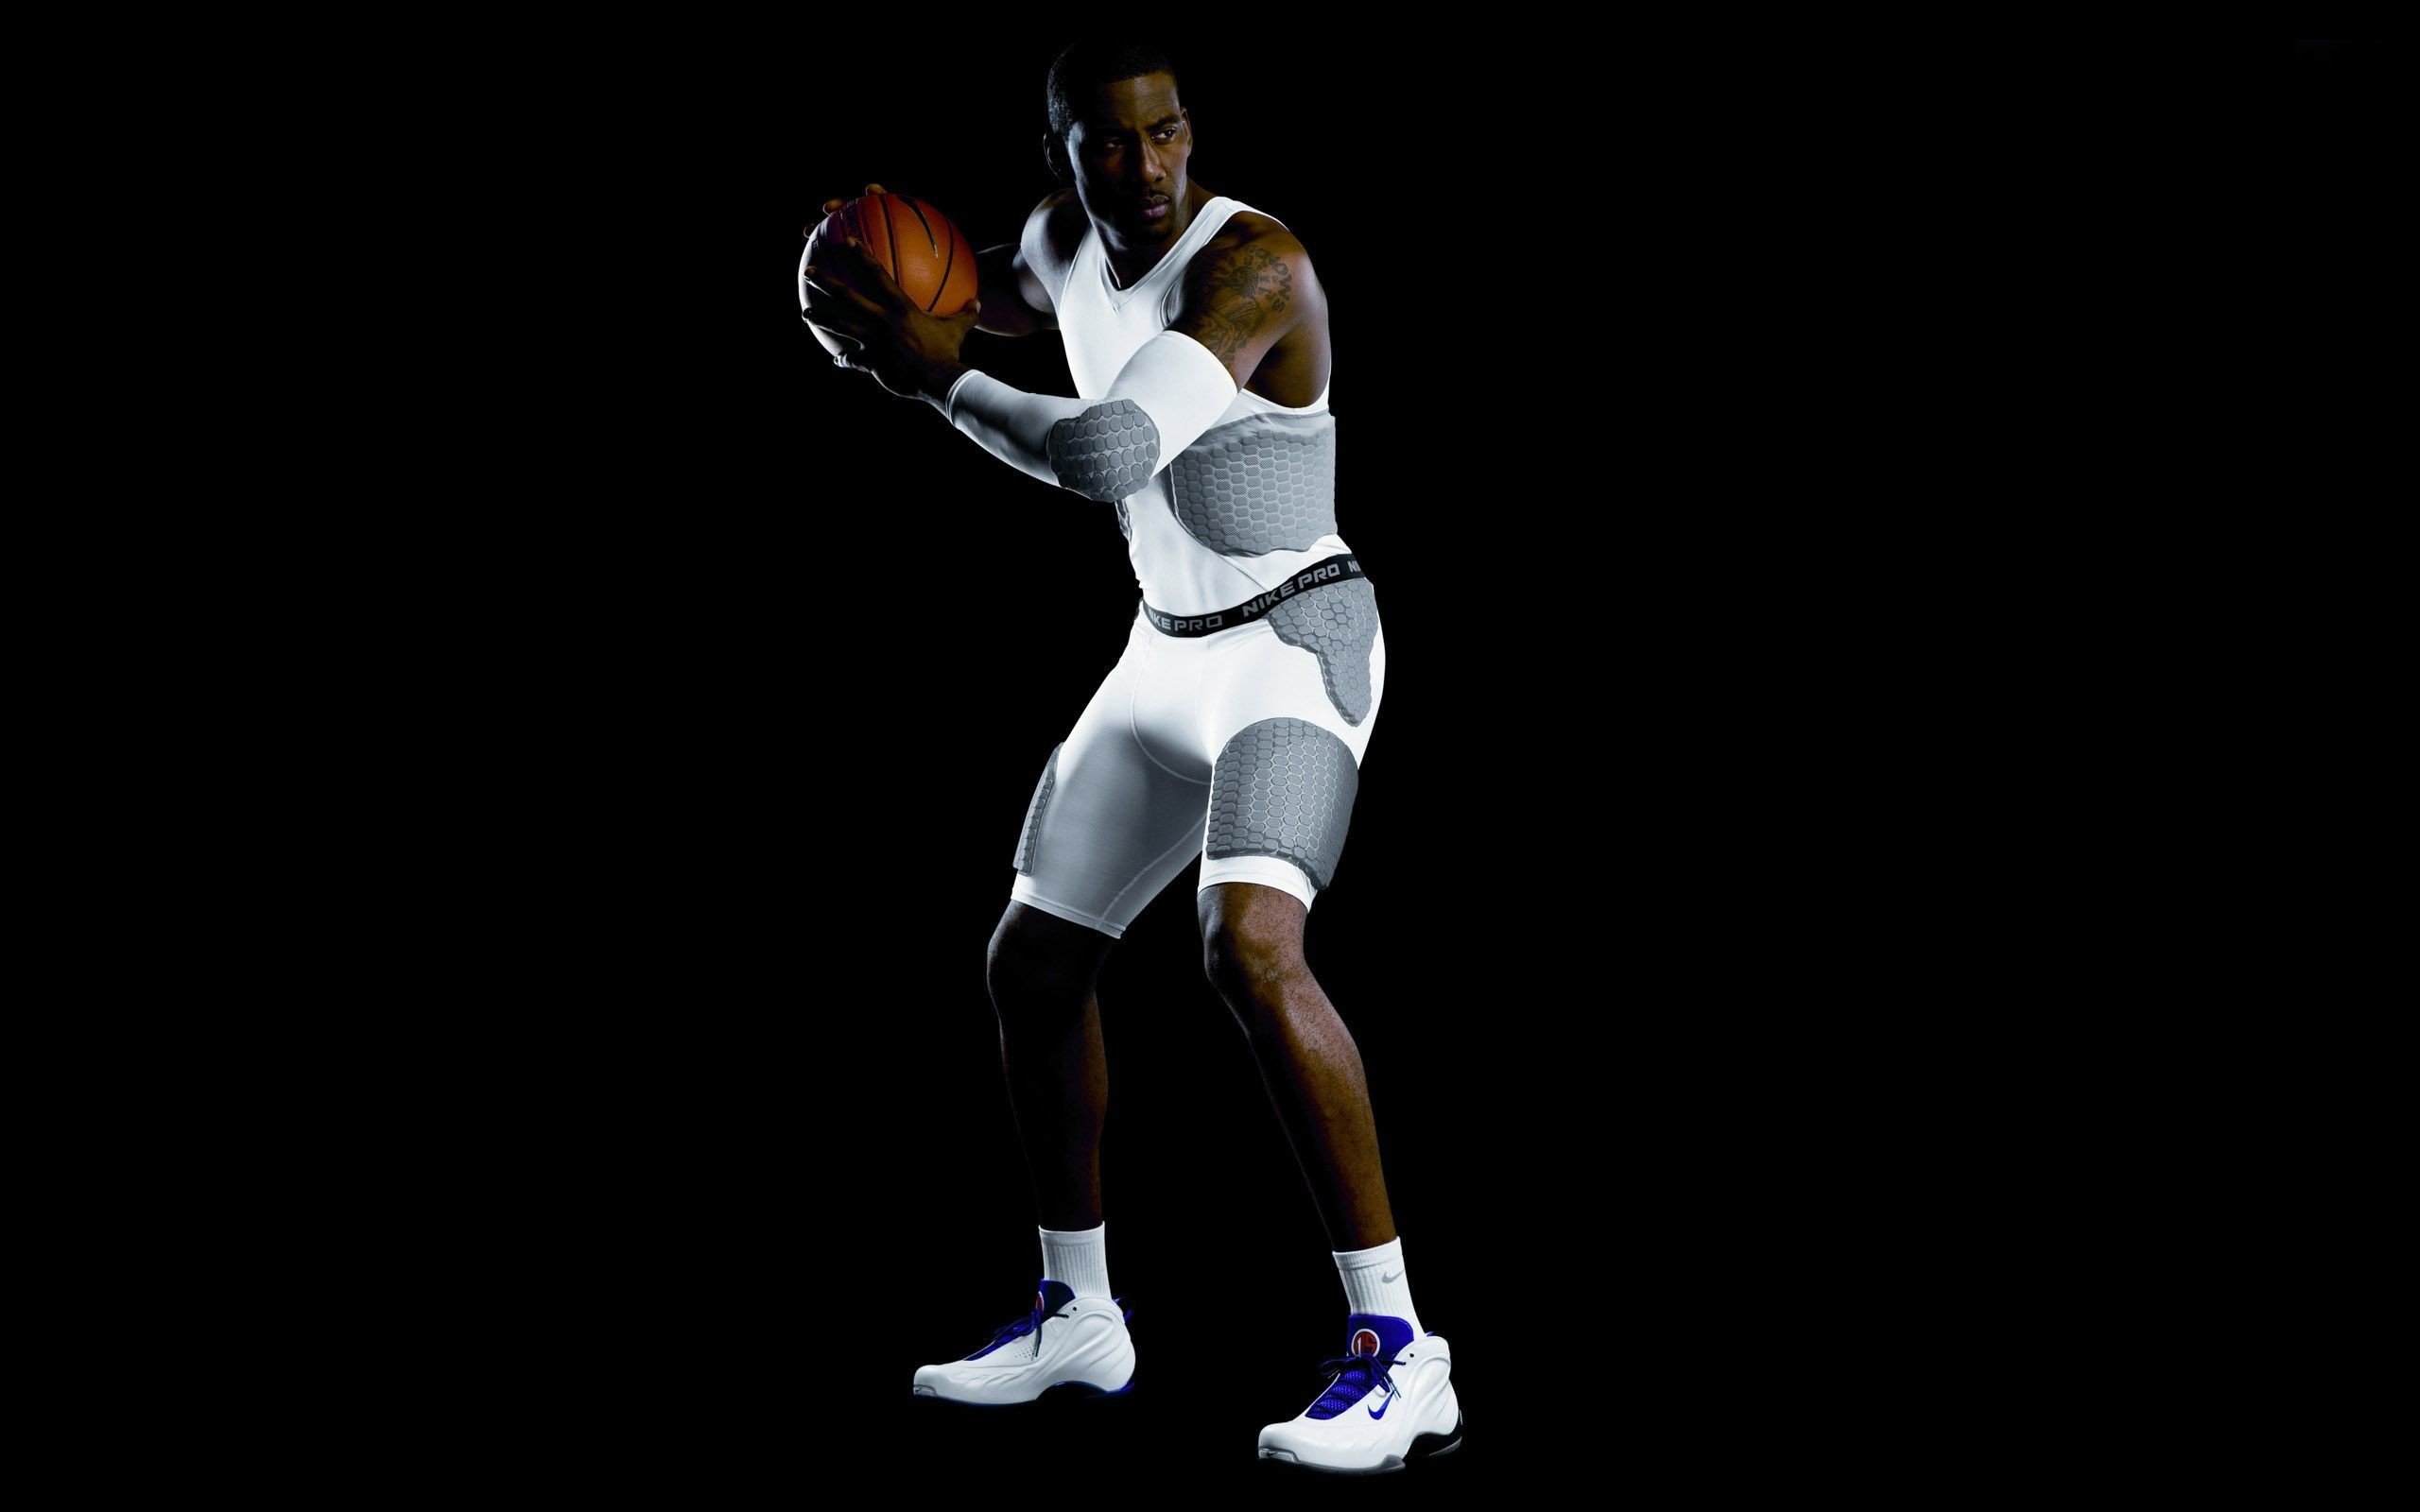 Lebron James Miami Heat Super Player Wallpaper HD.